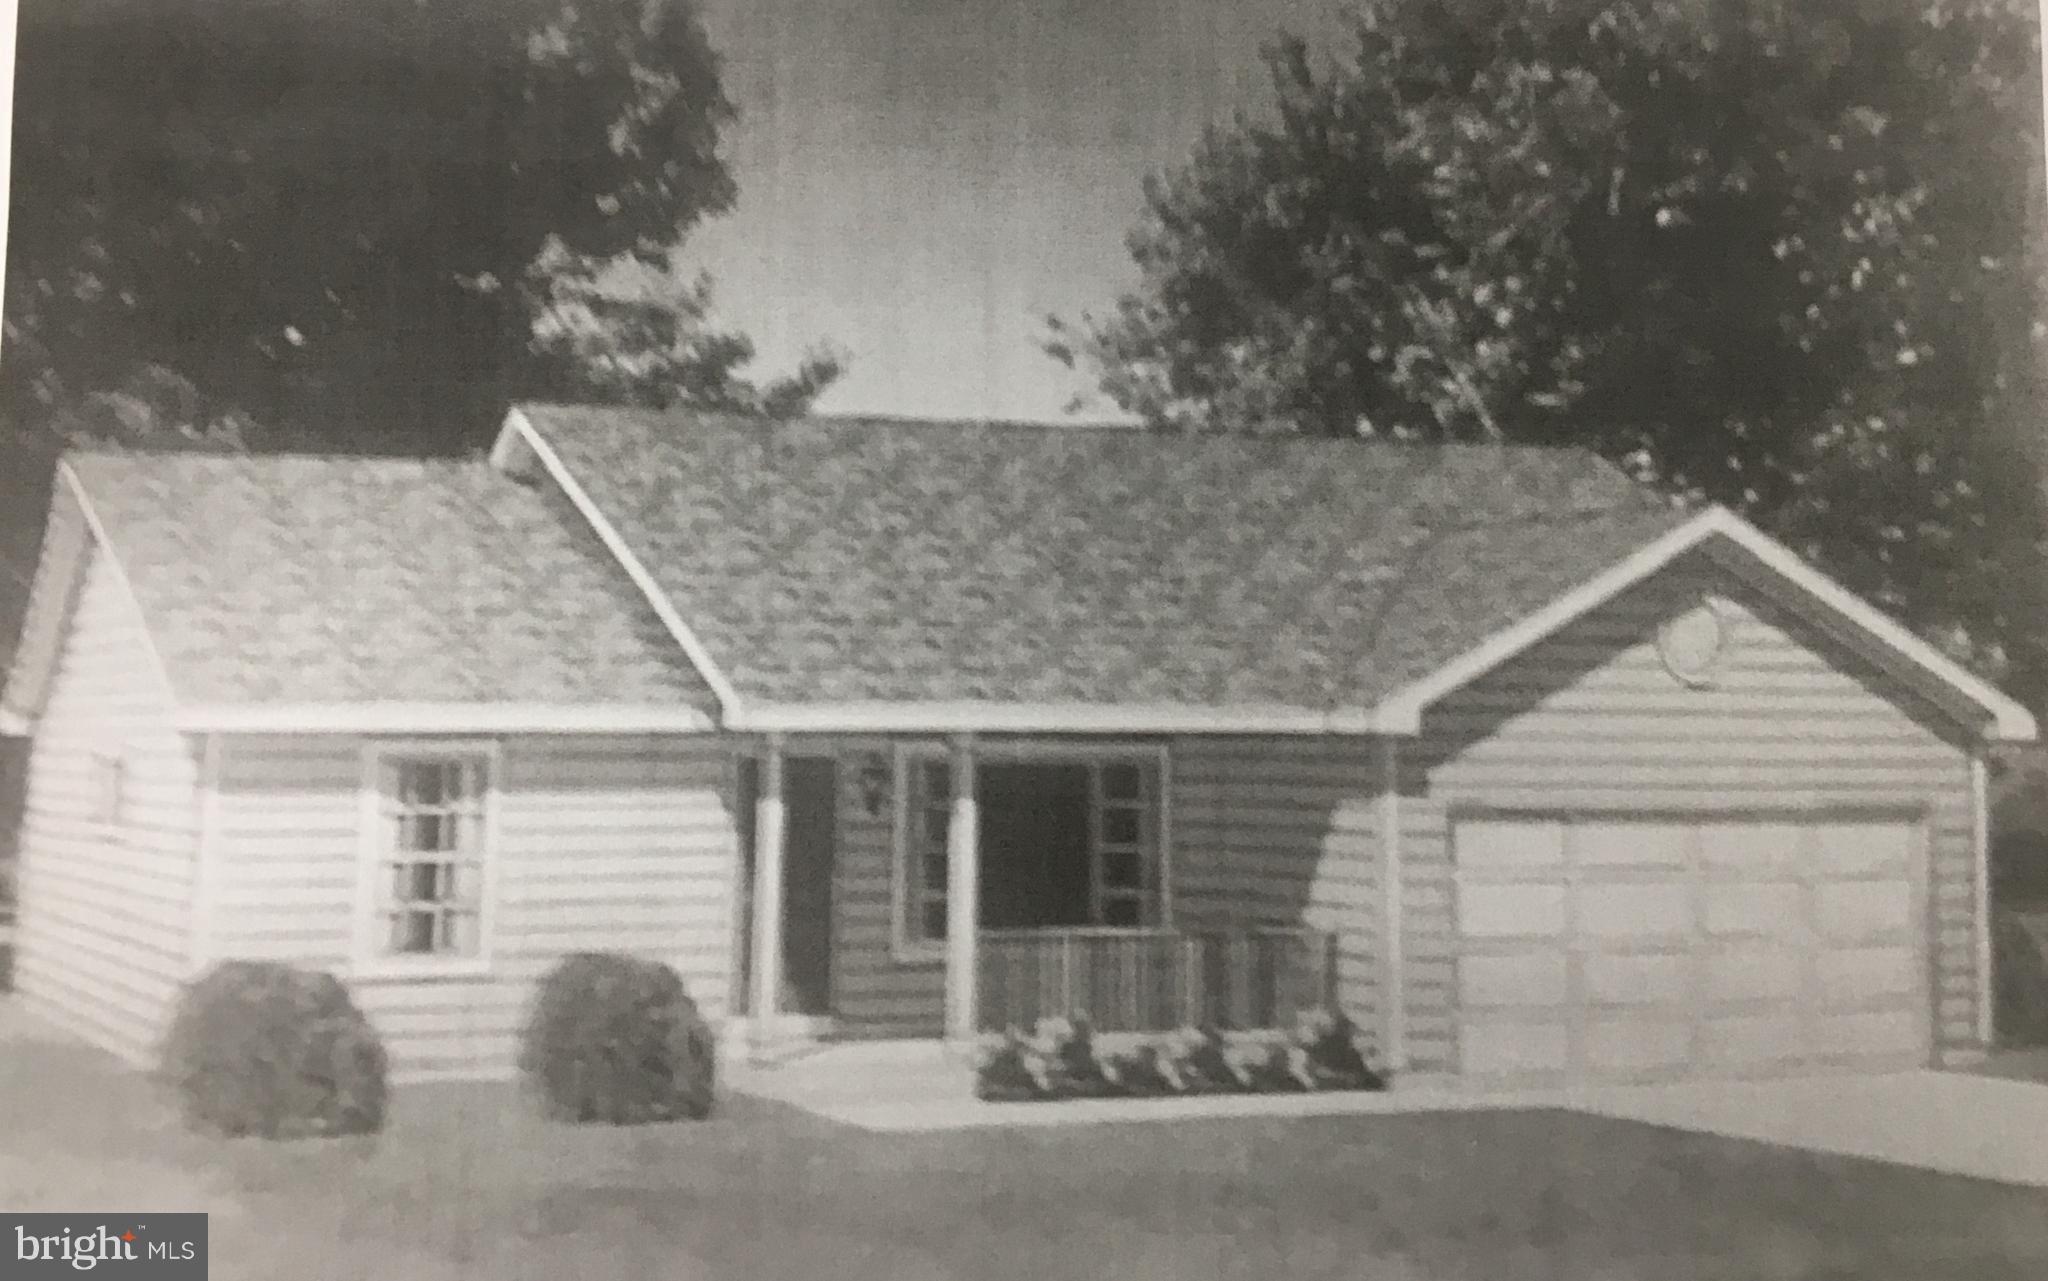 0 MOUNTAIN BOULEVARD, WERNERSVILLE, PA 19565